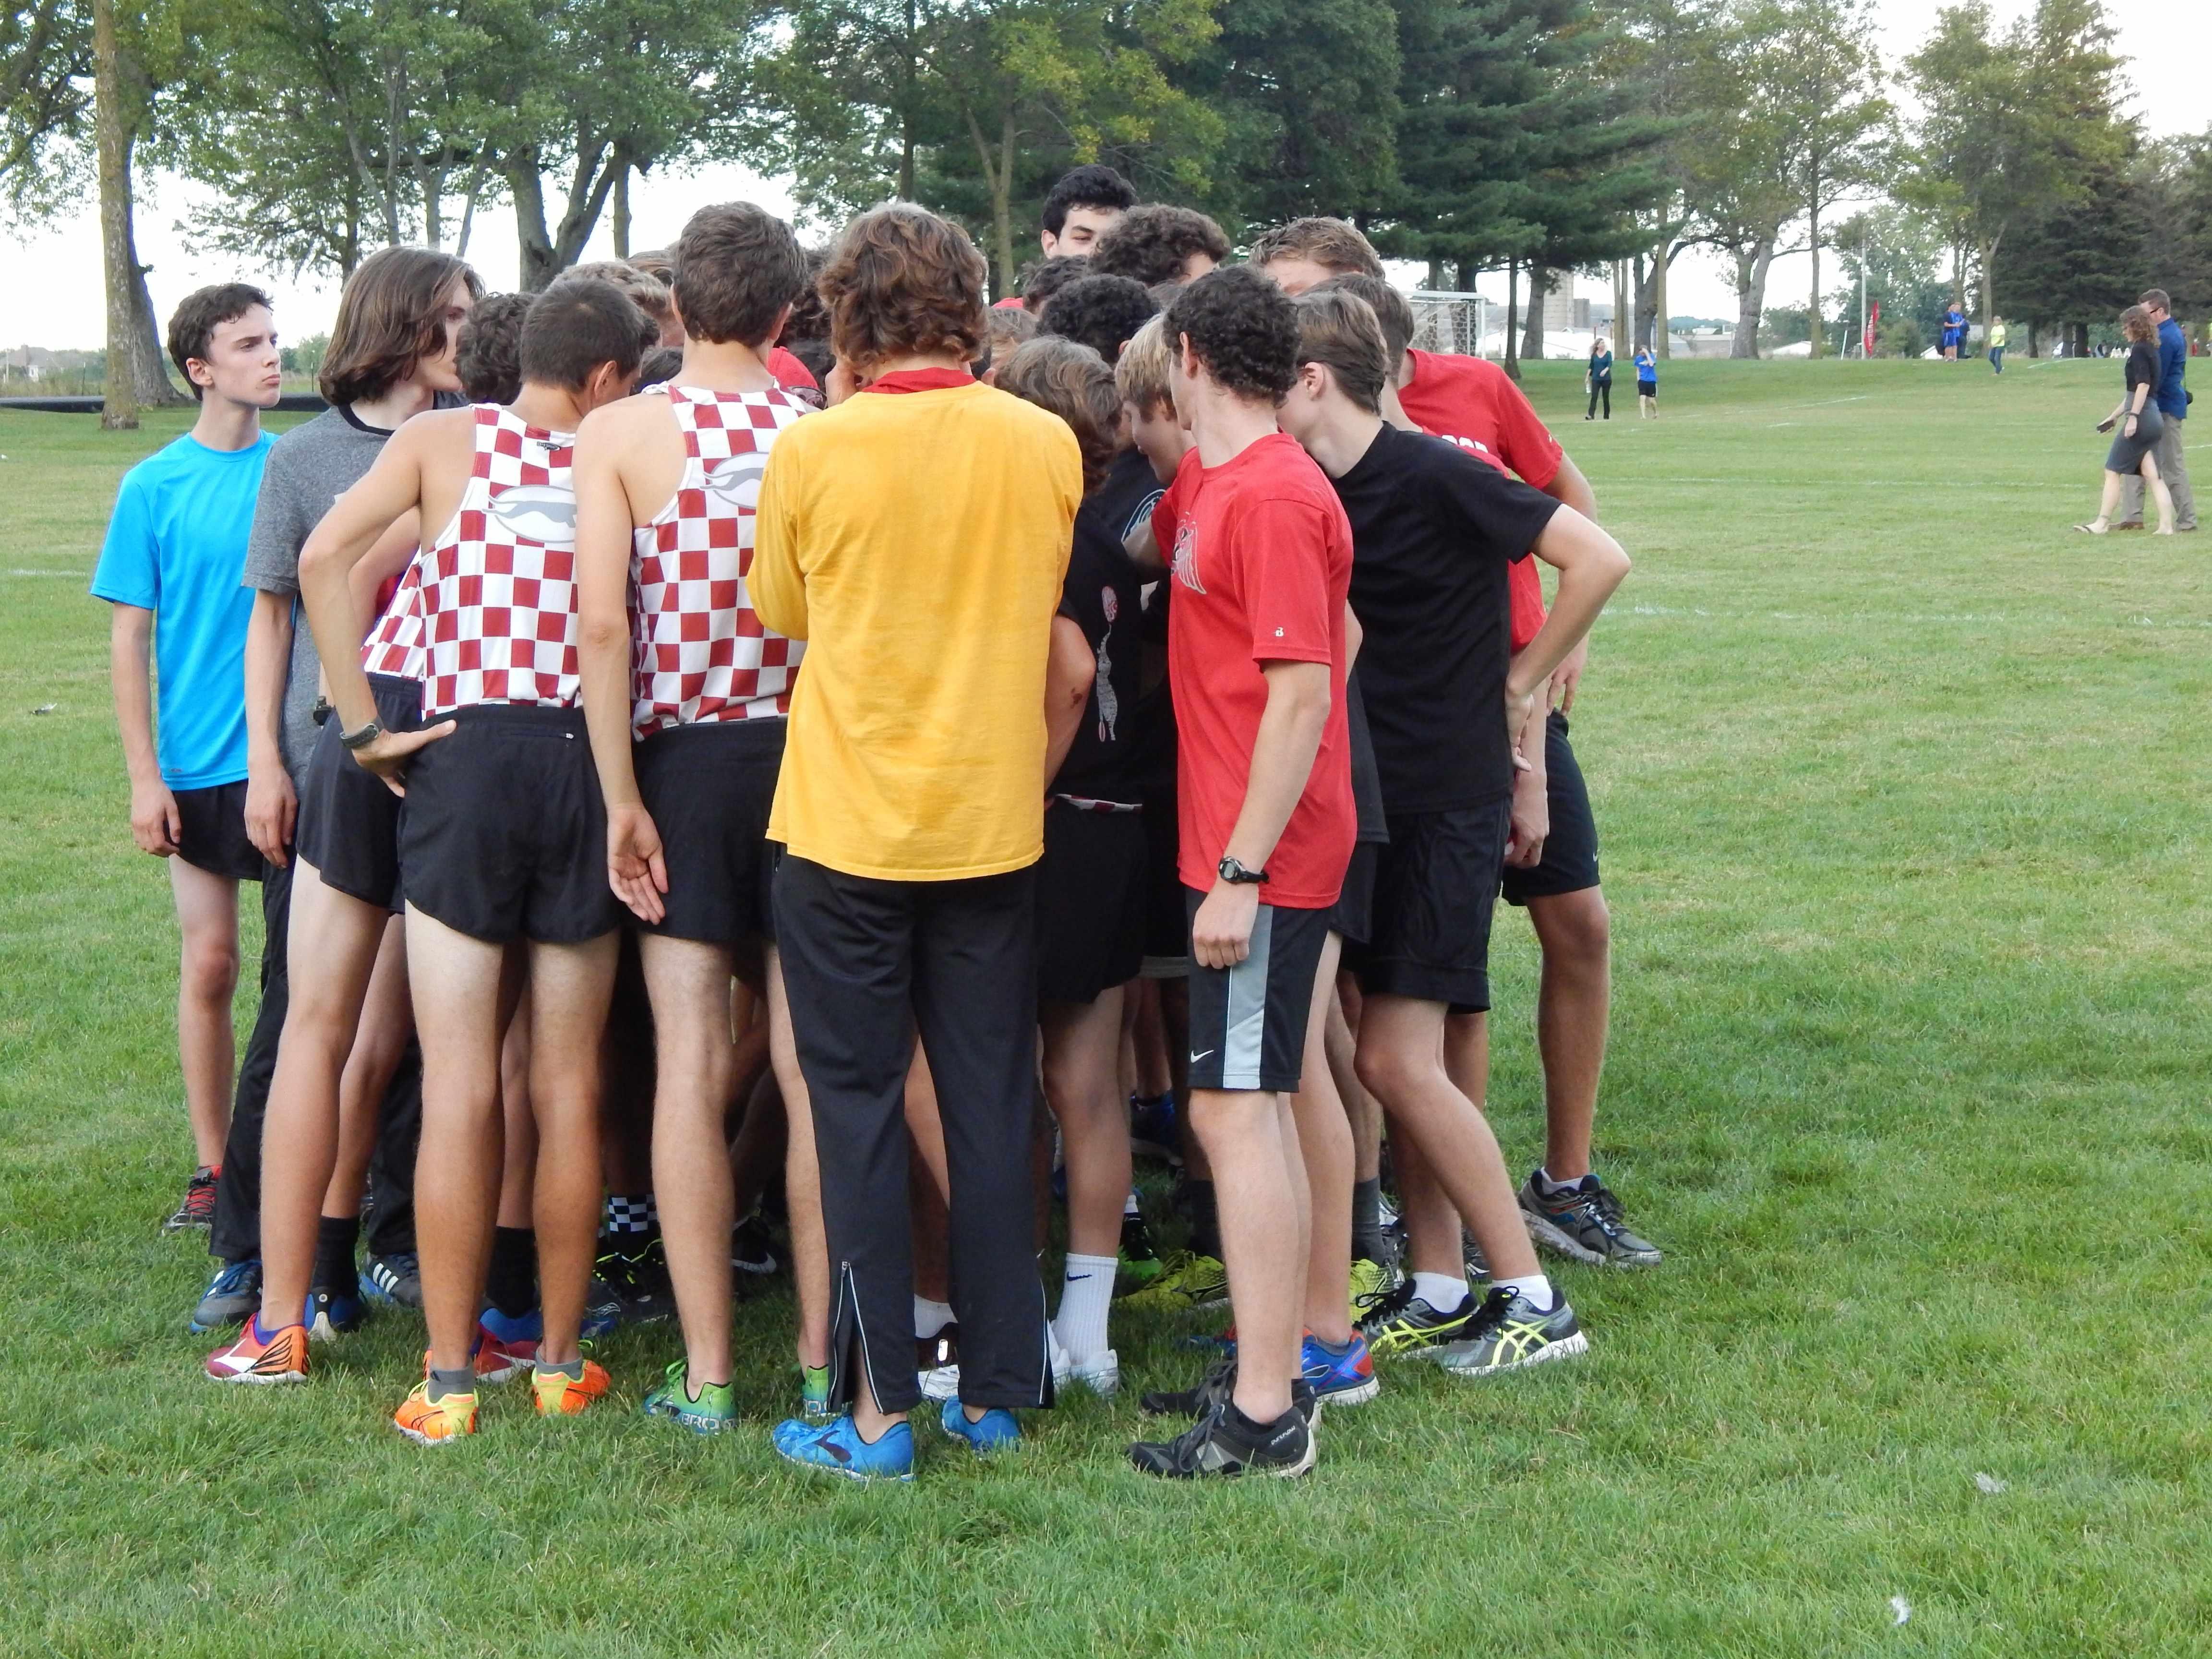 Pre-race huddle